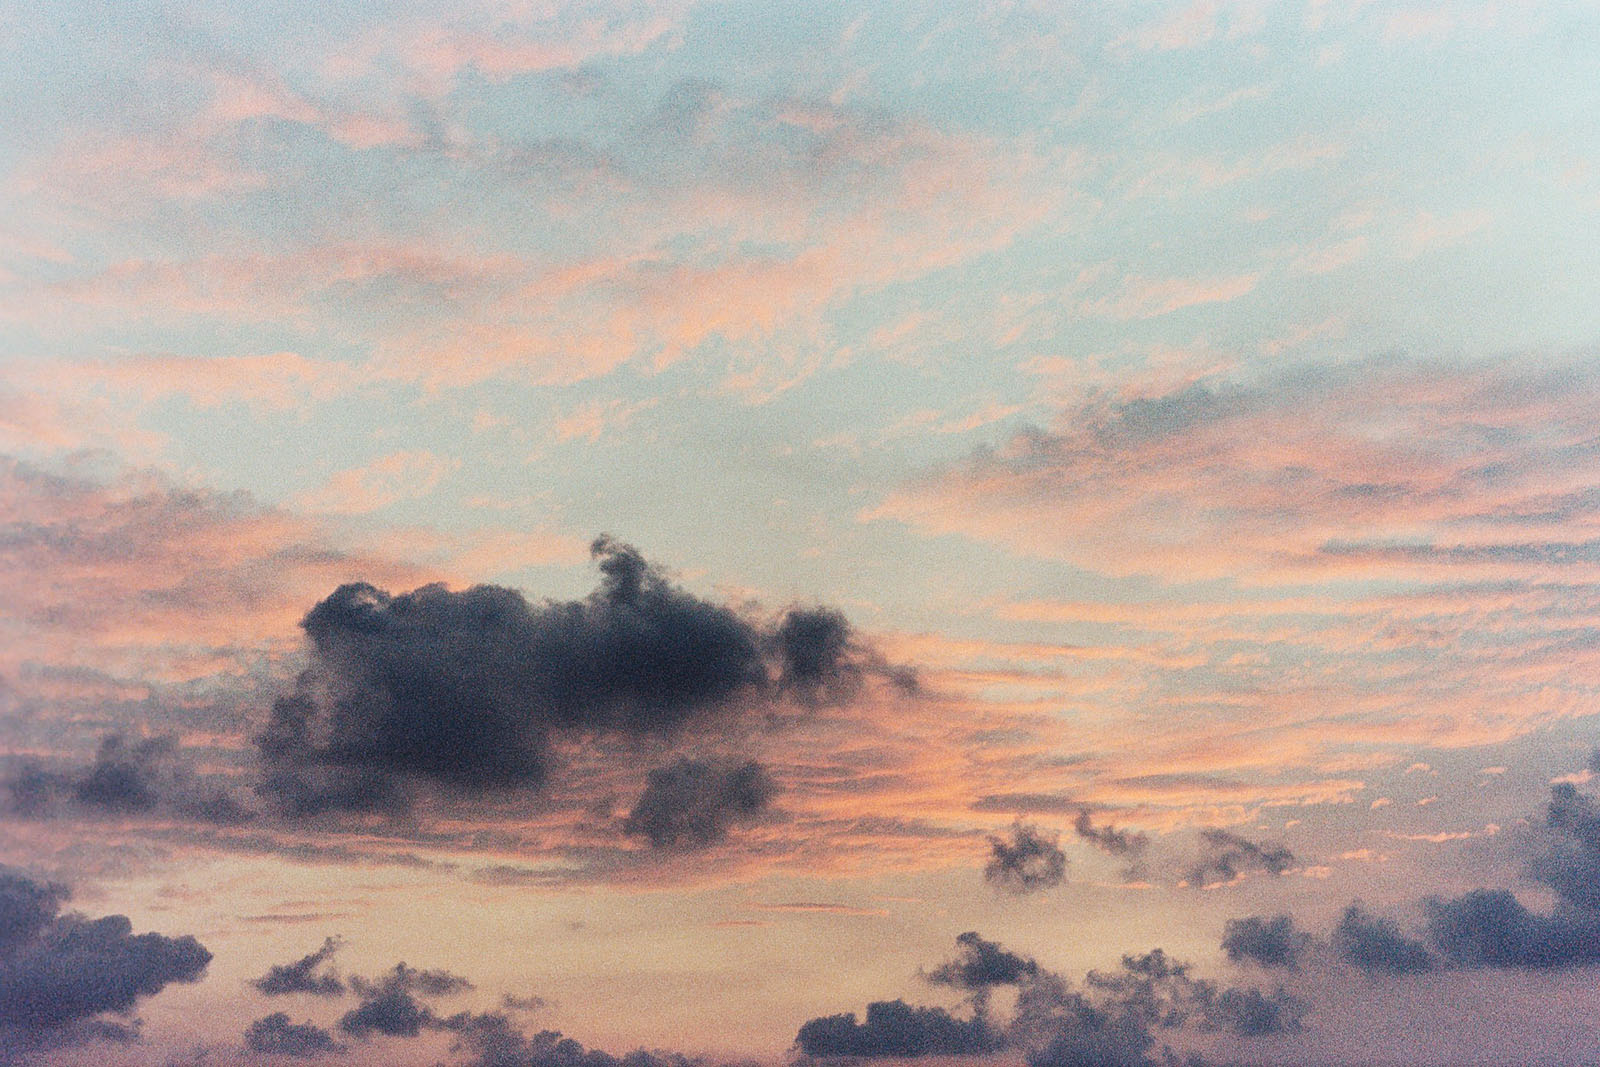 Sunset clouds at Baan Koh Mak | Thailand Travel Photos